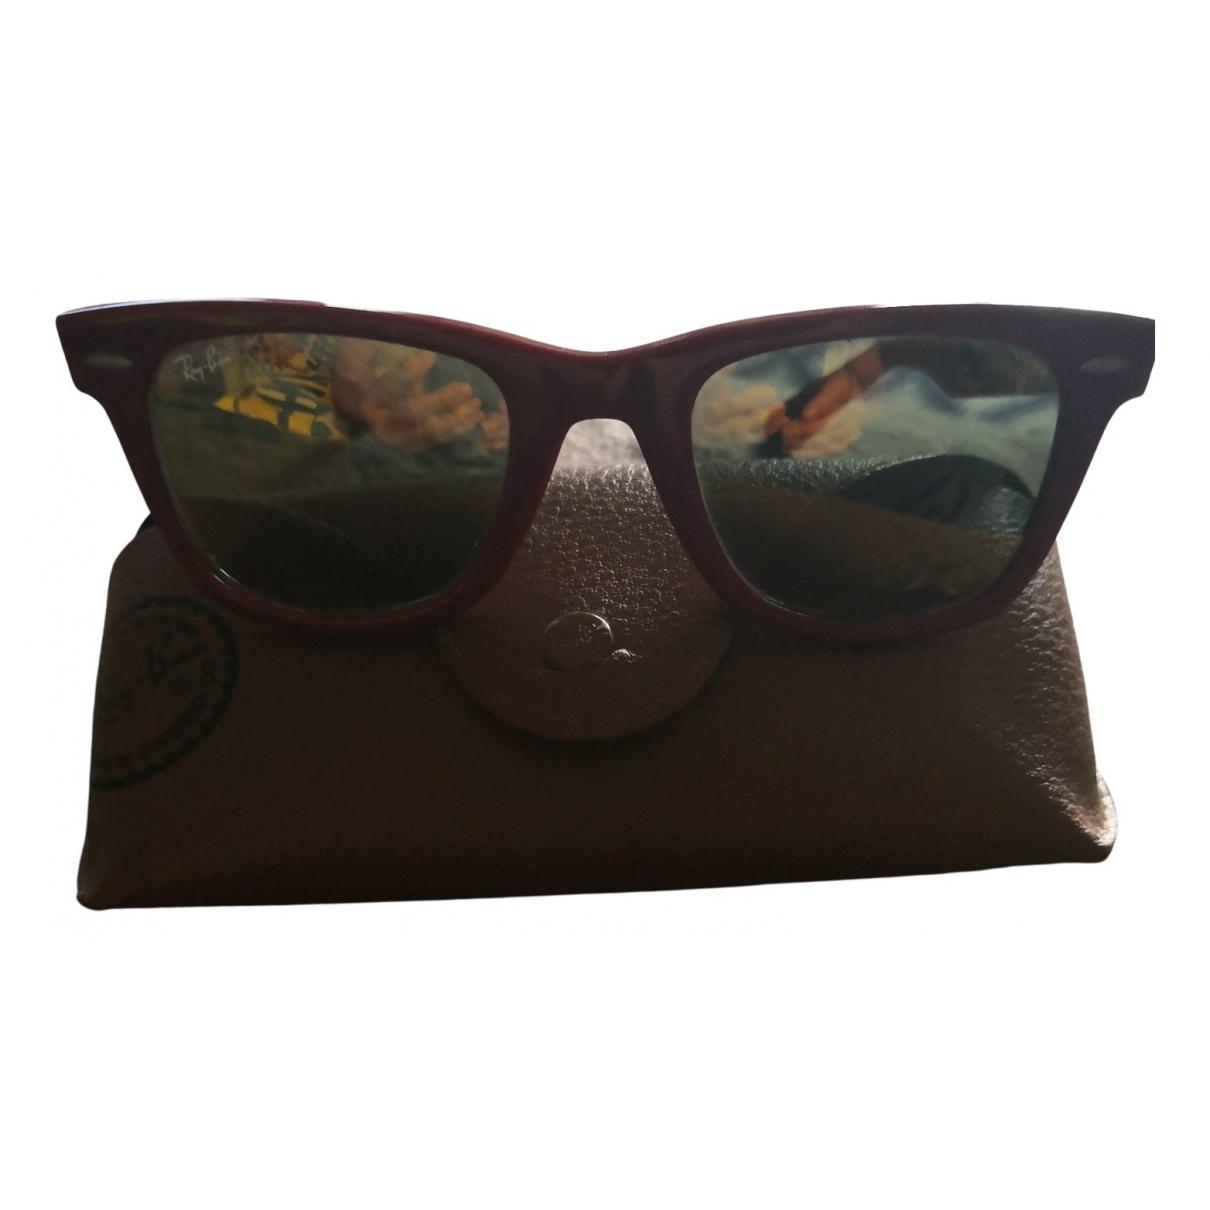 Ray-ban Original Wayfarer Sonnenbrillen in  Bordeauxrot Kunststoff